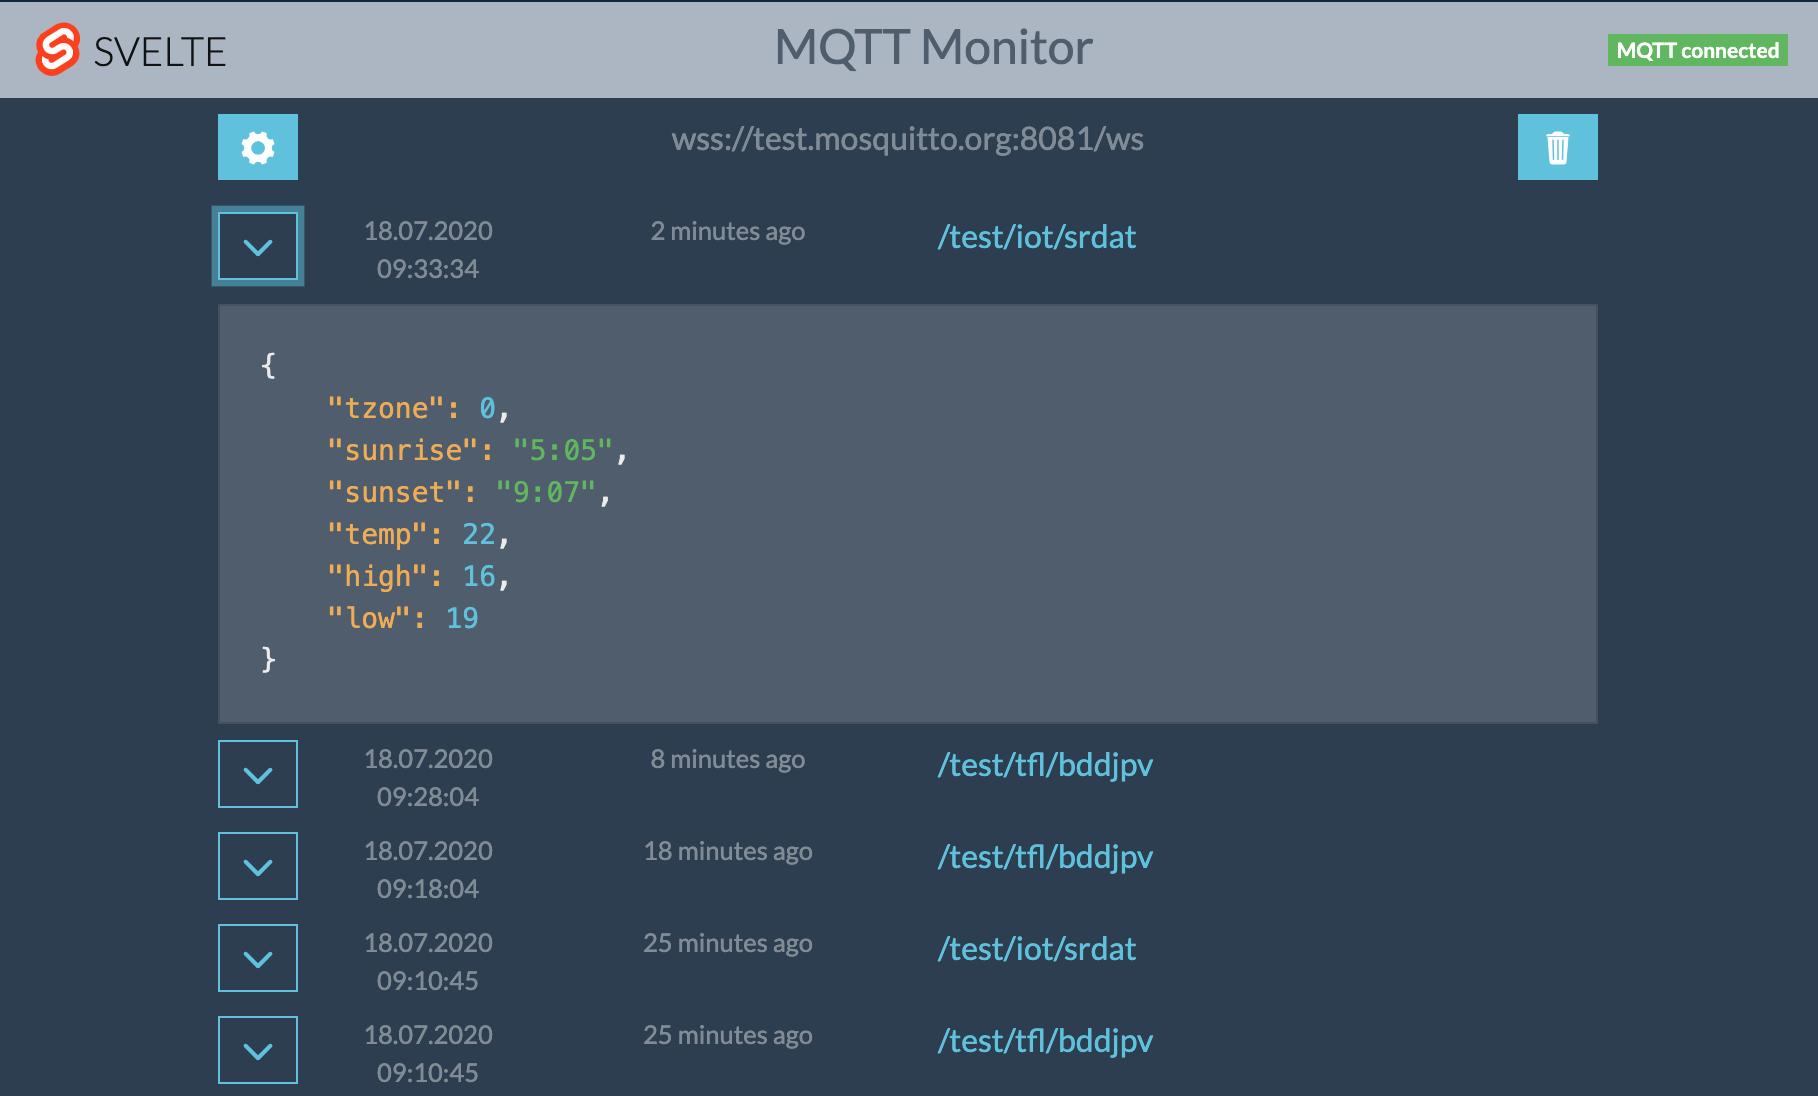 Screenshot of Svelte MQTT Monitor